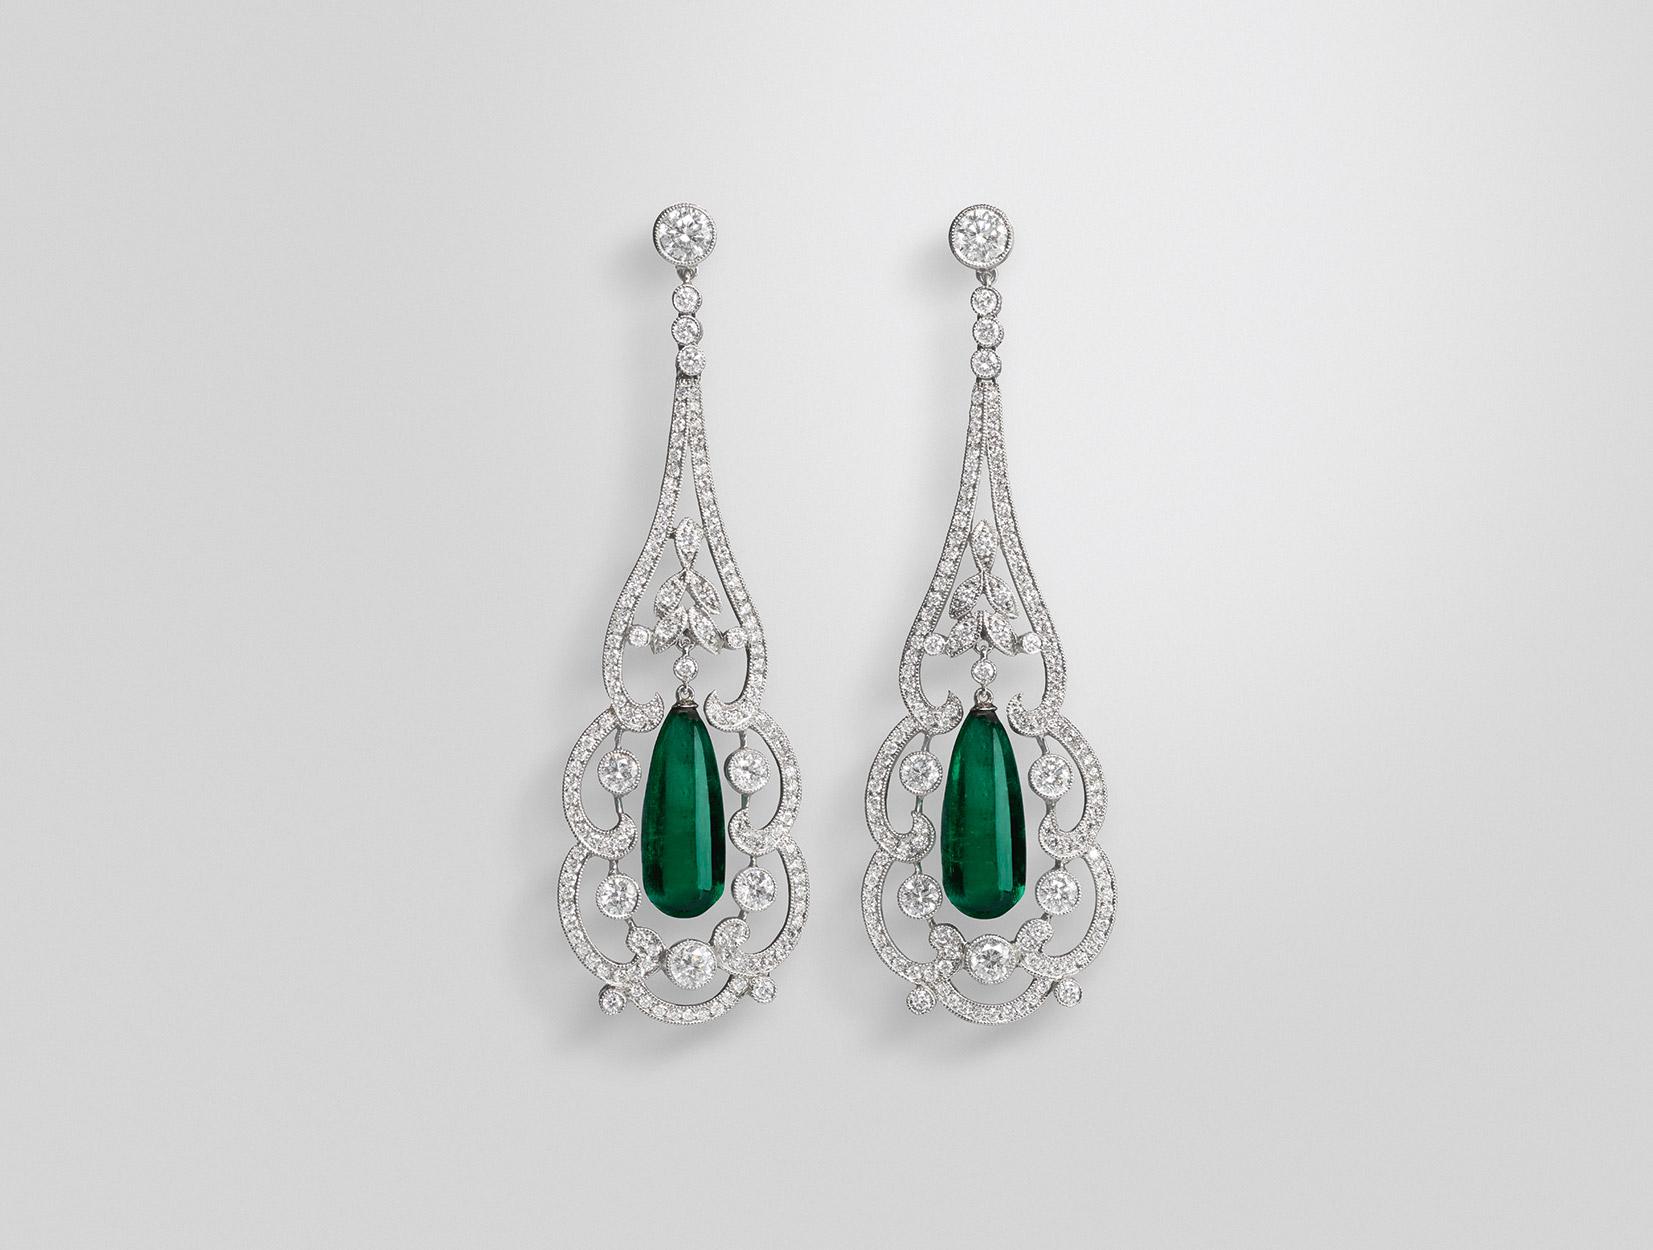 Emerald Earrings 01 | Maria Gaspari